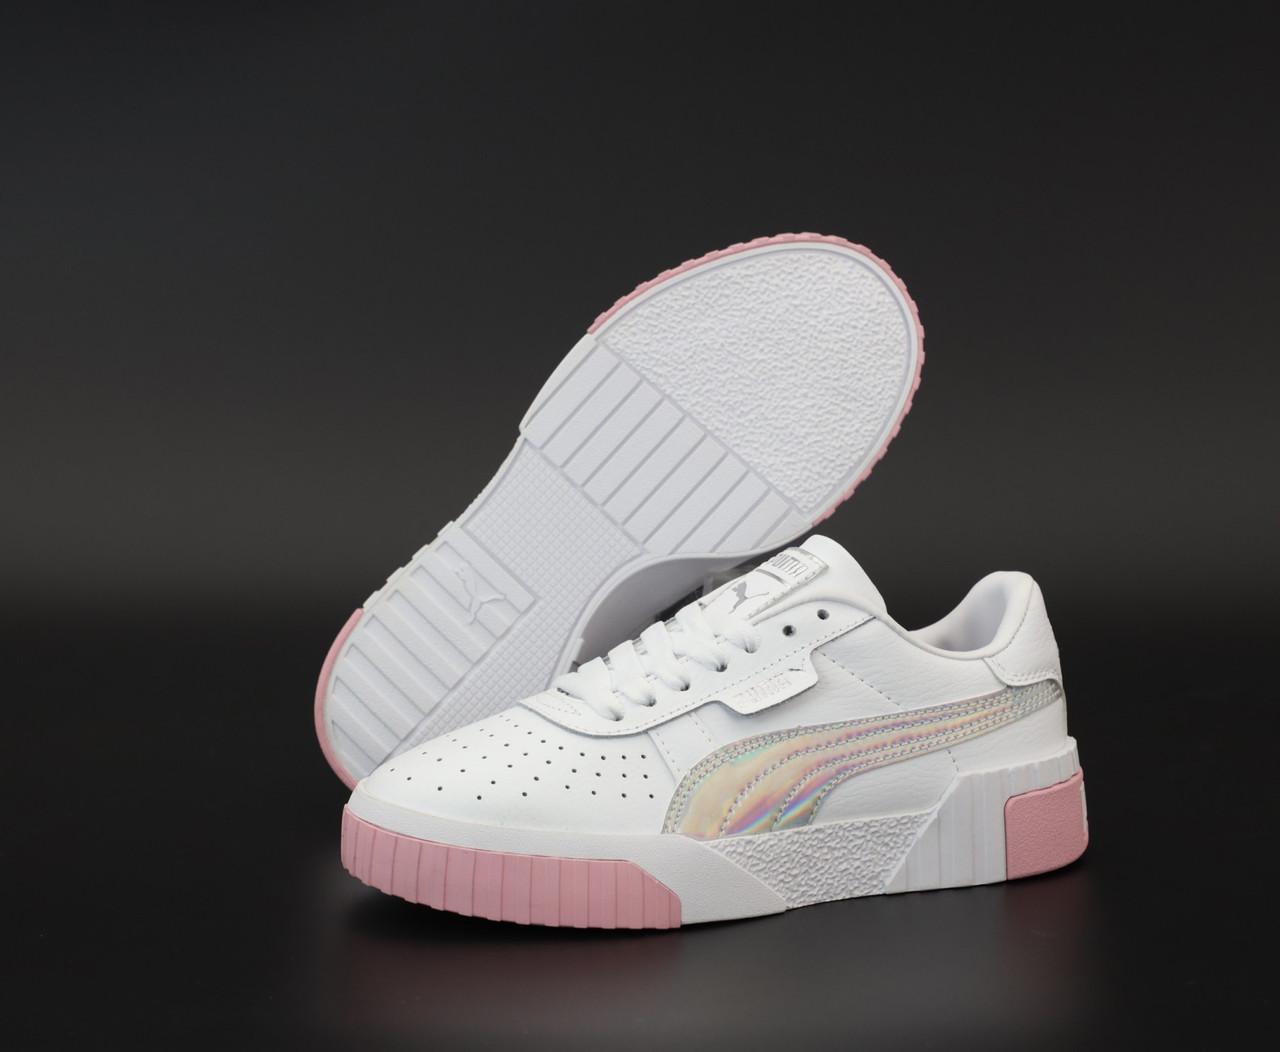 Женские кроссовки Puma Cali. White Pink. ТОП реплика ААА класса.